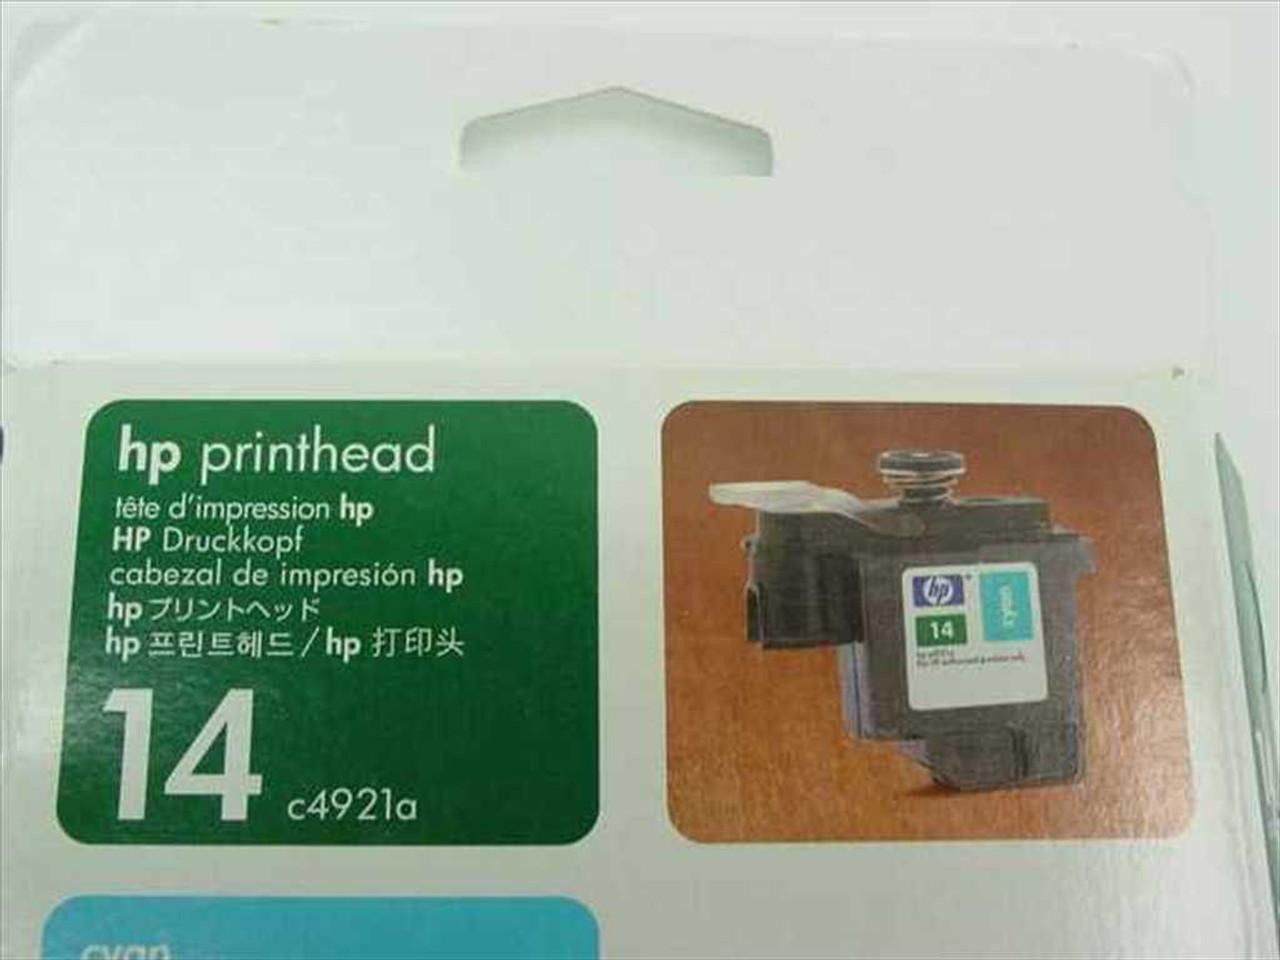 Hp Printer Printhead